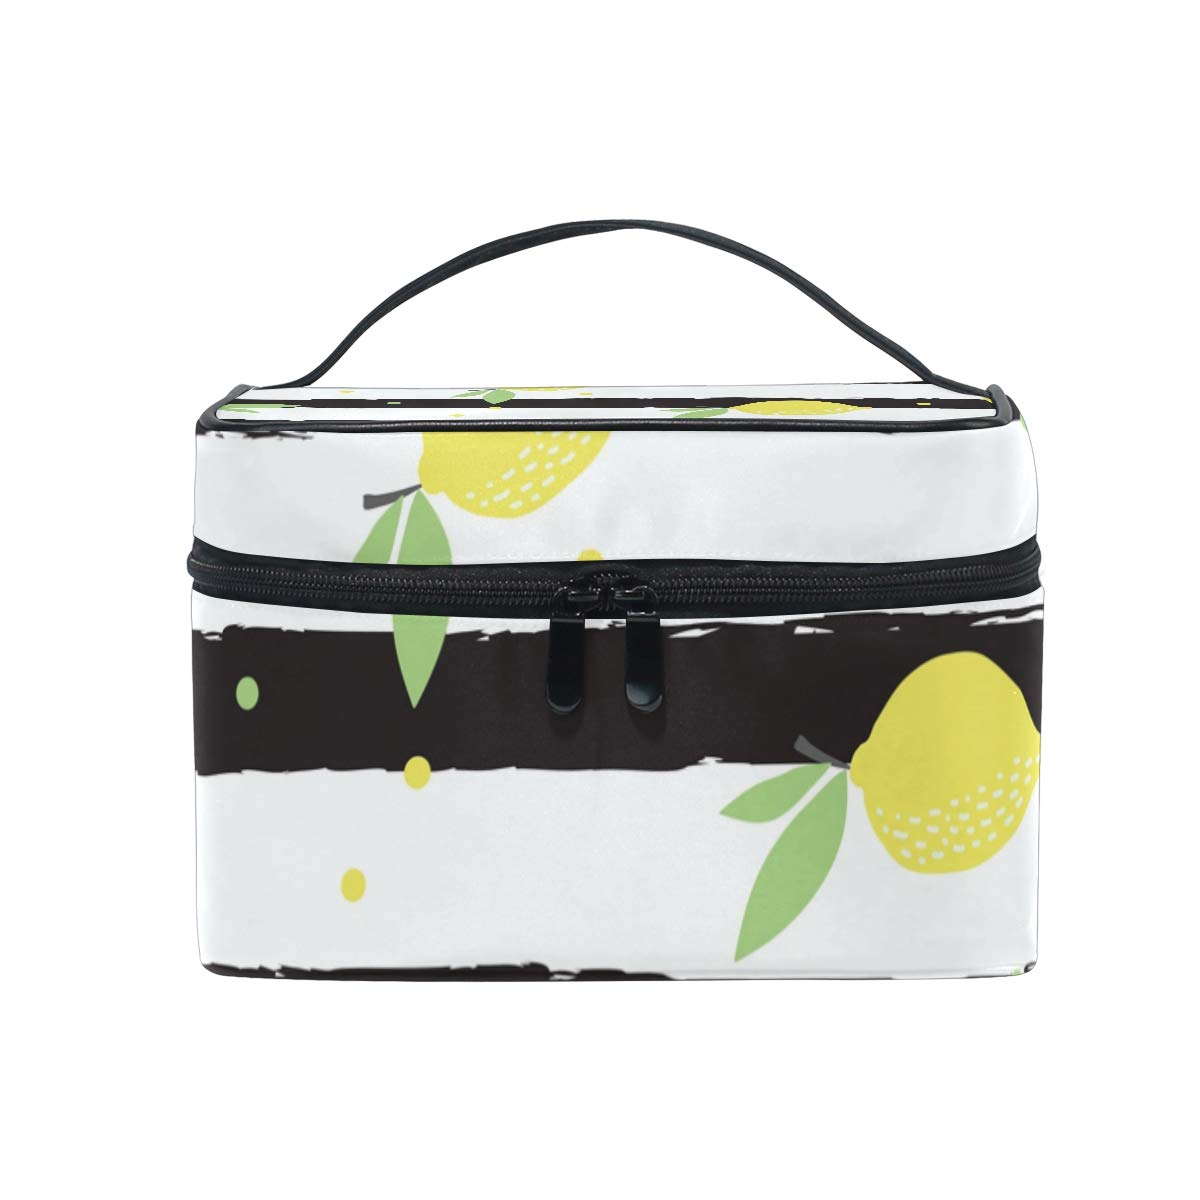 Yellow Lemon Travel Bag Portable Luggage Bags Duffle Bag Large Capacity Travel Organizer Bag